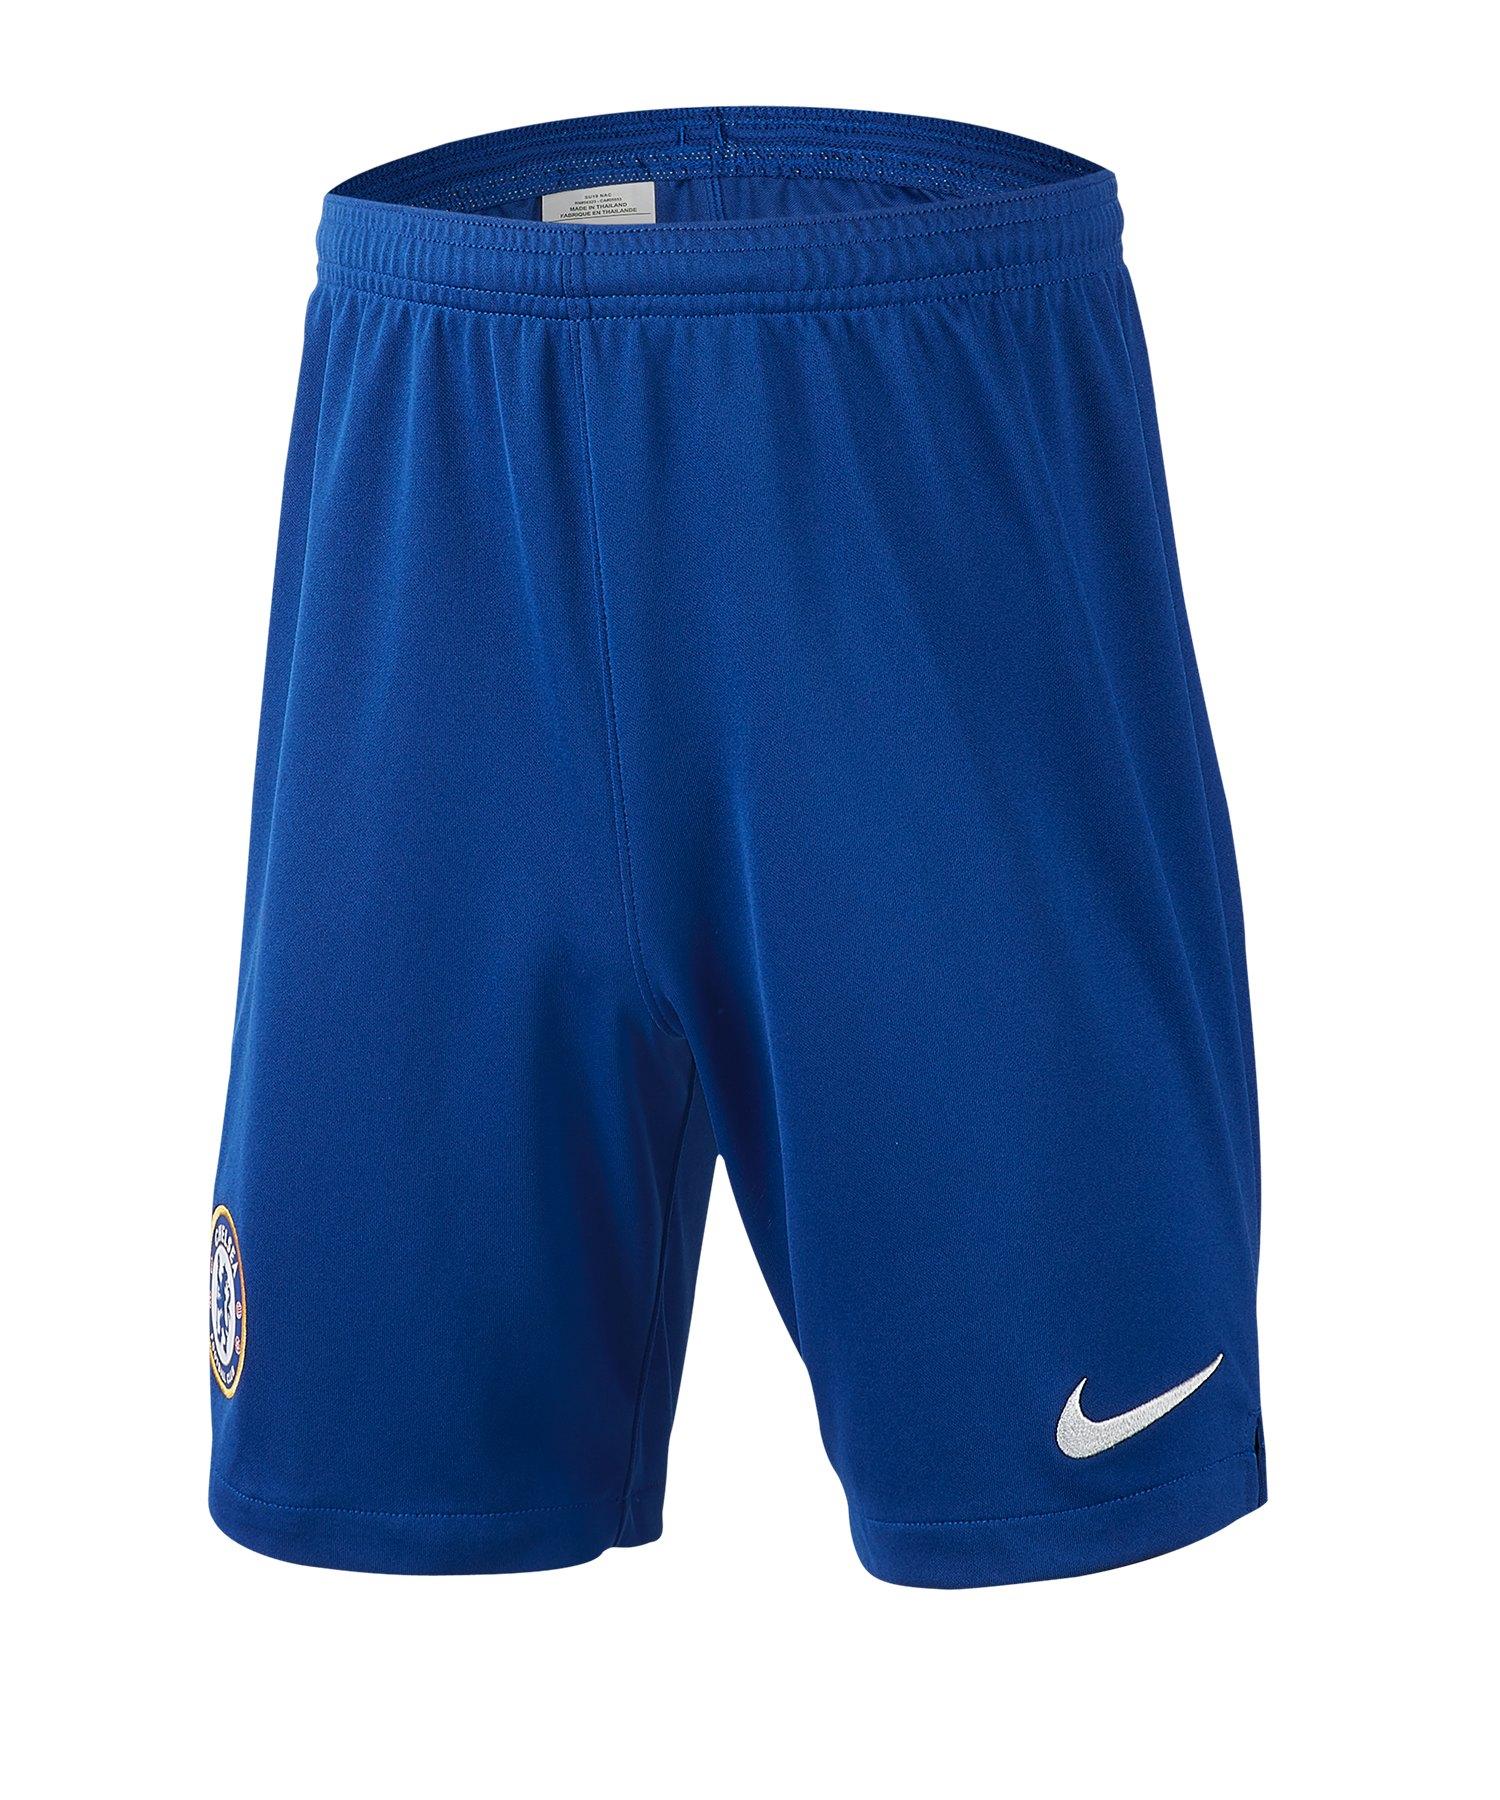 Nike FC Chelsea London Short Home Kids 19/20 F494 - Blau